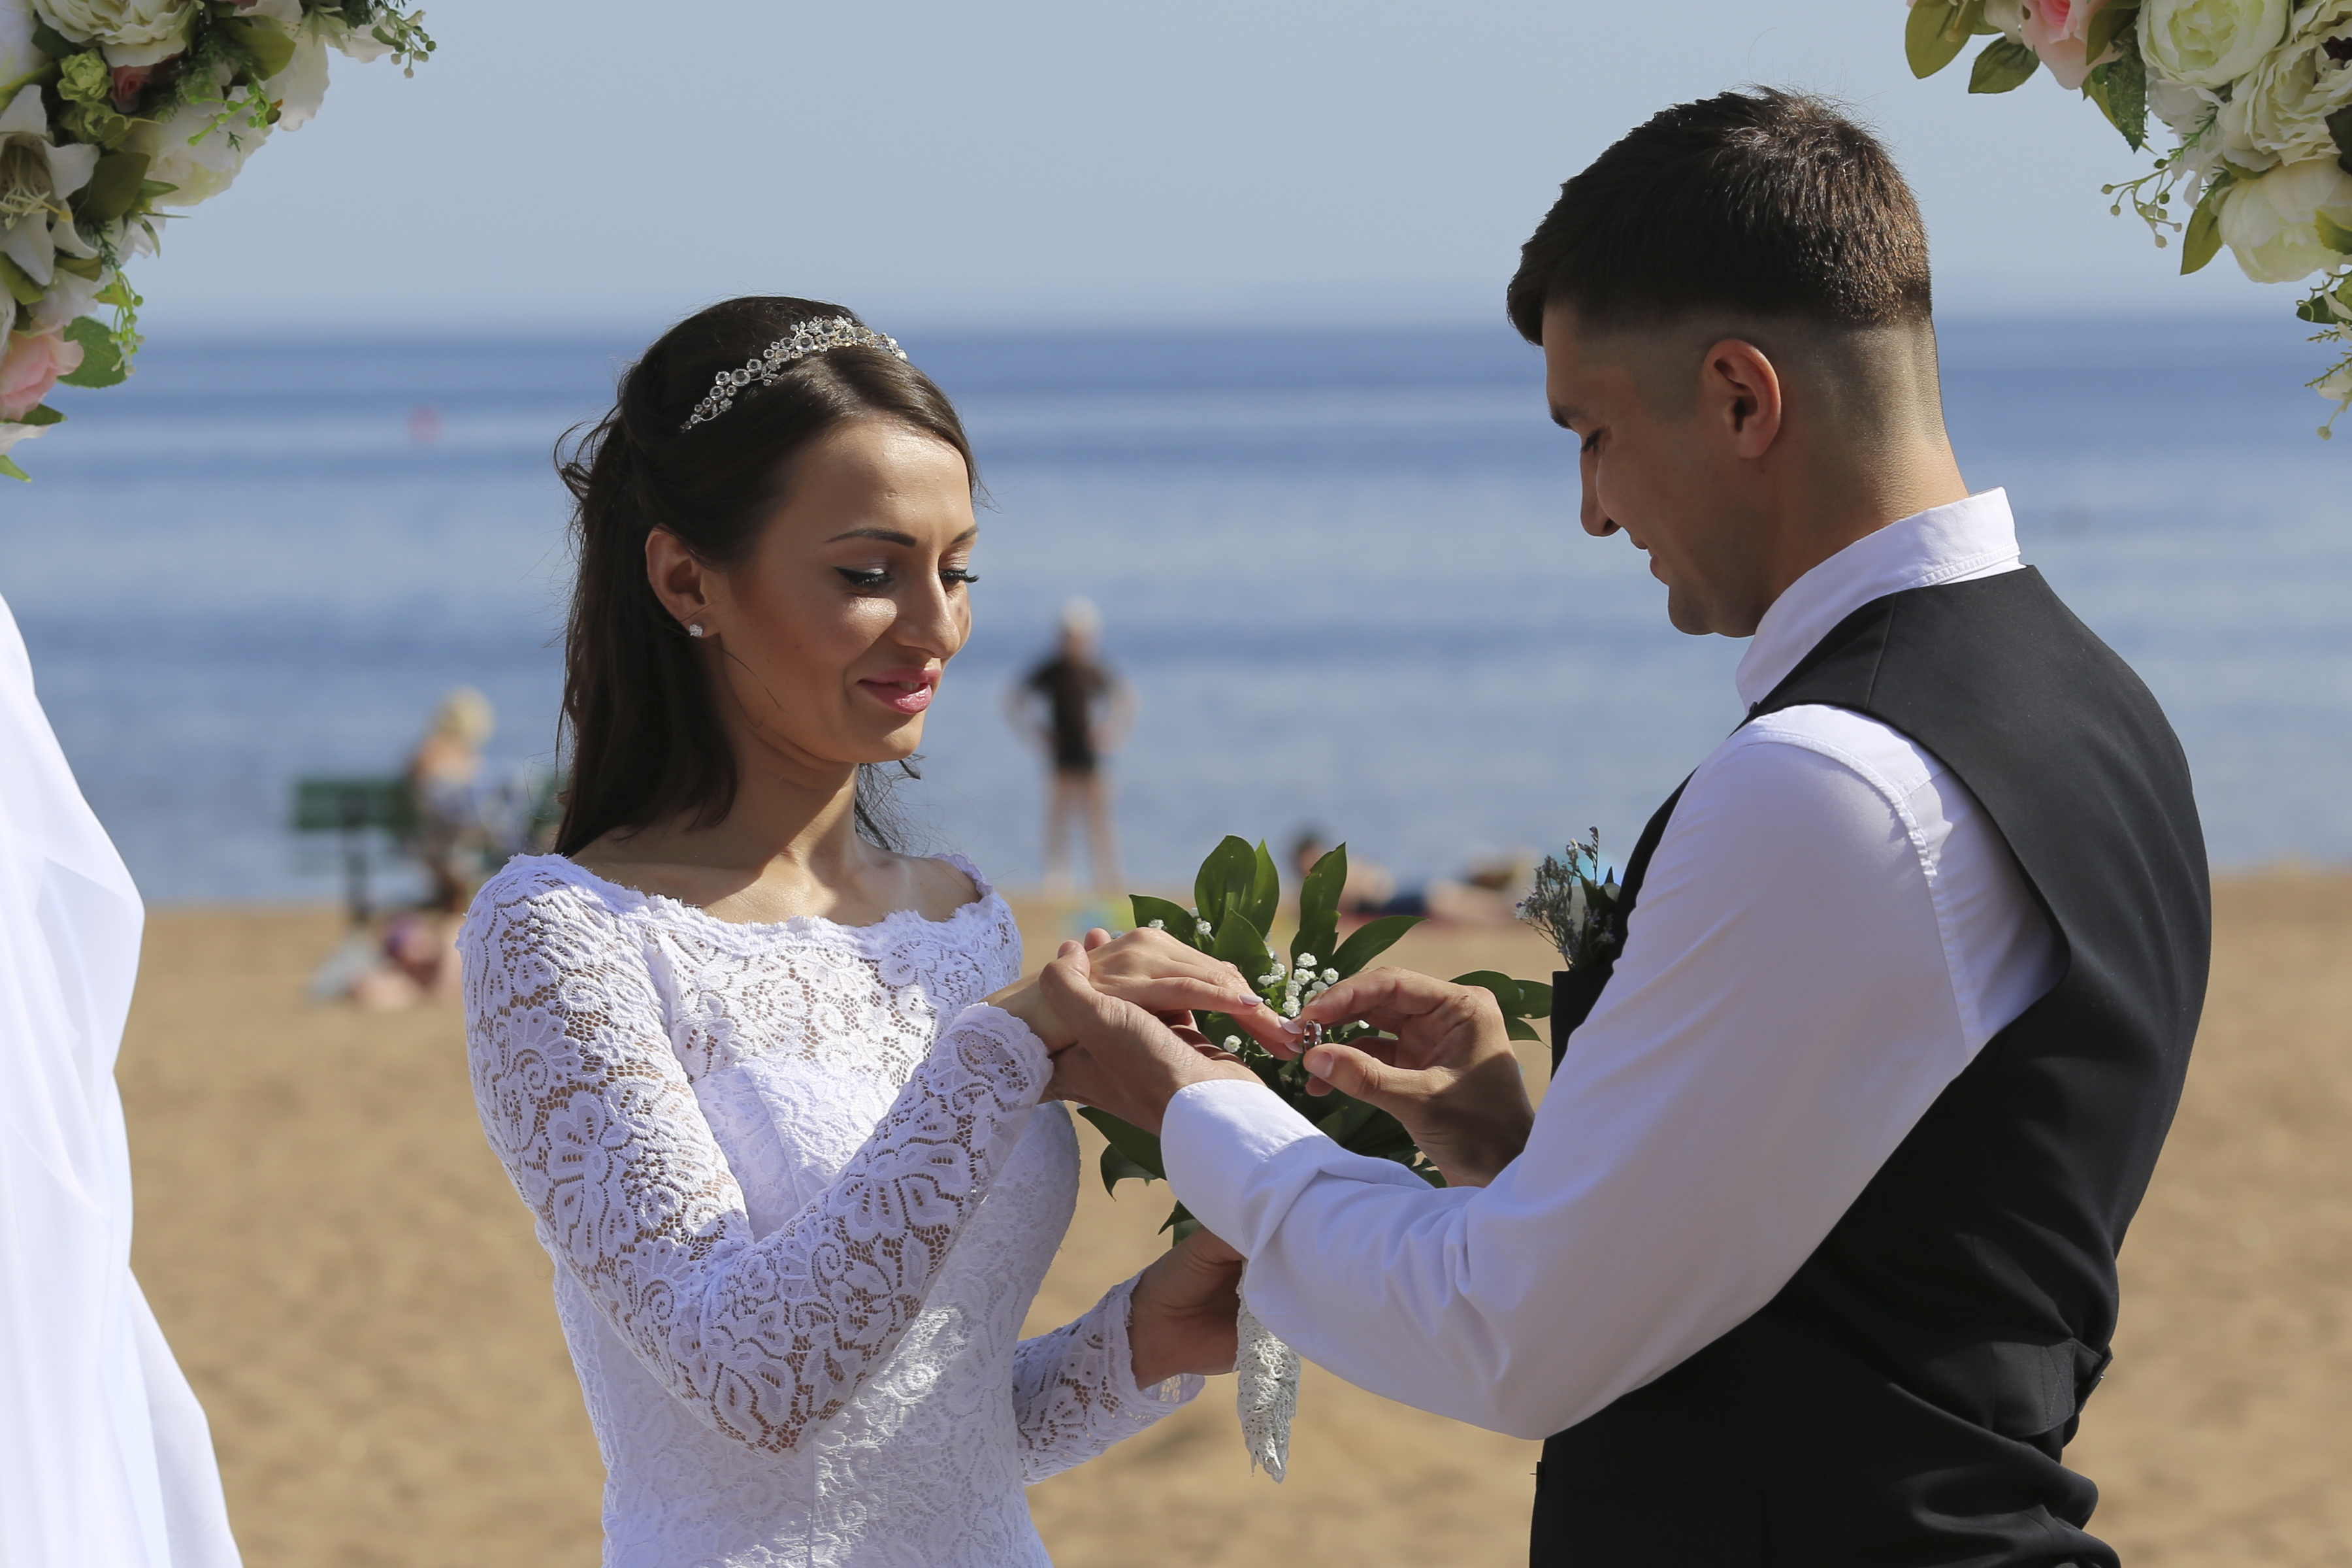 https://sleeklens.com/wp-content/uploads/2018/09/wedding-lightroom-presets-signature-bride-groom-before-9.jpg